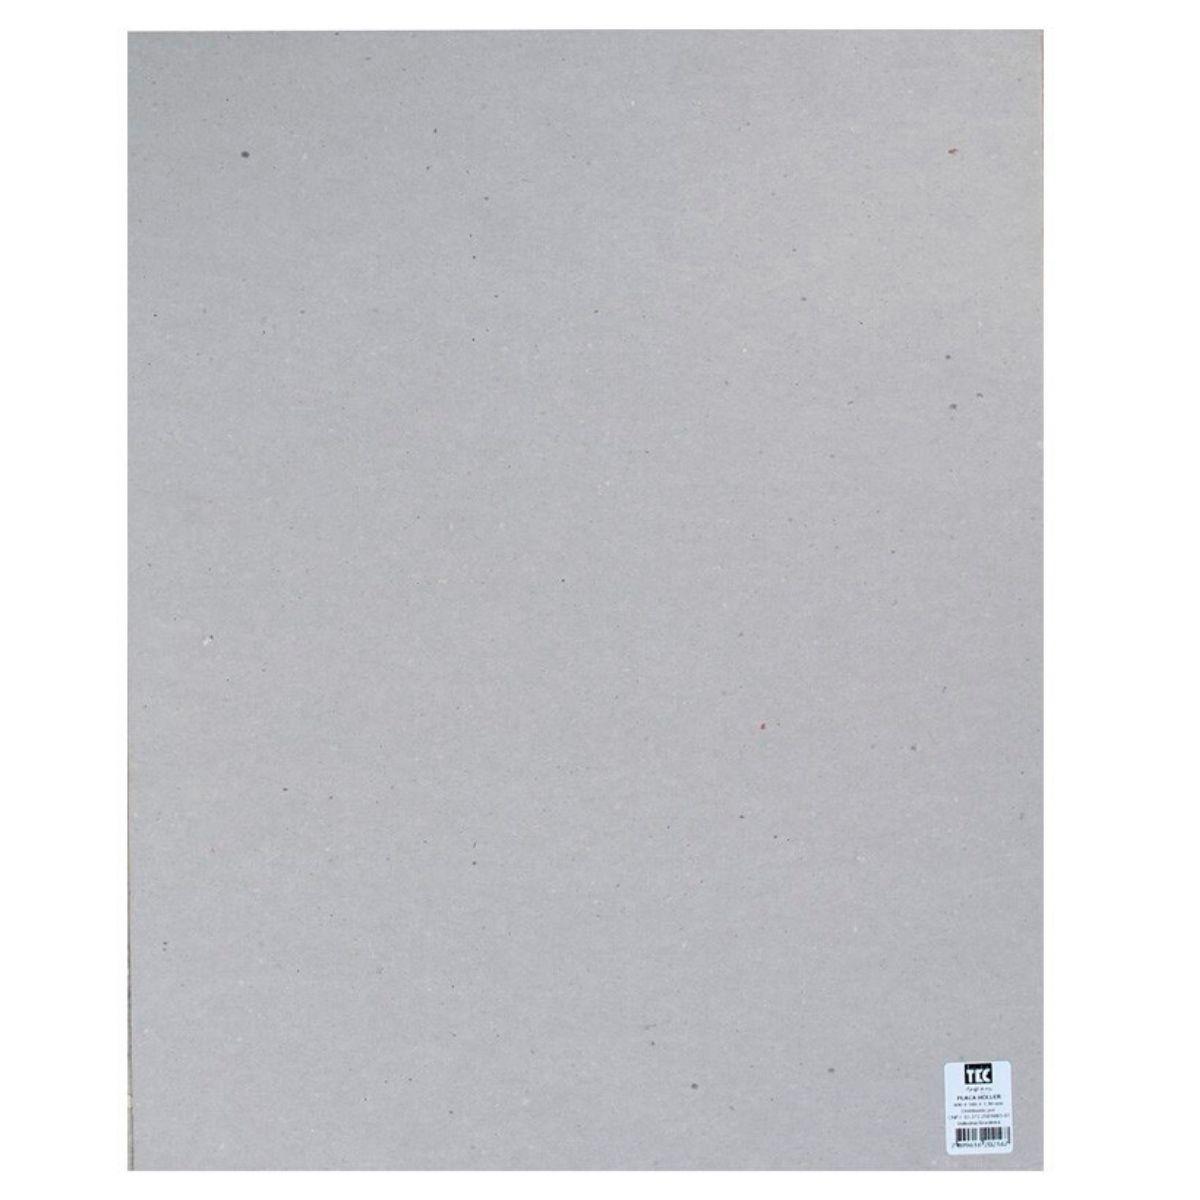 Papelão Cinza tipo Papel Holler 800 x 500 x 2mm Toke e Crie